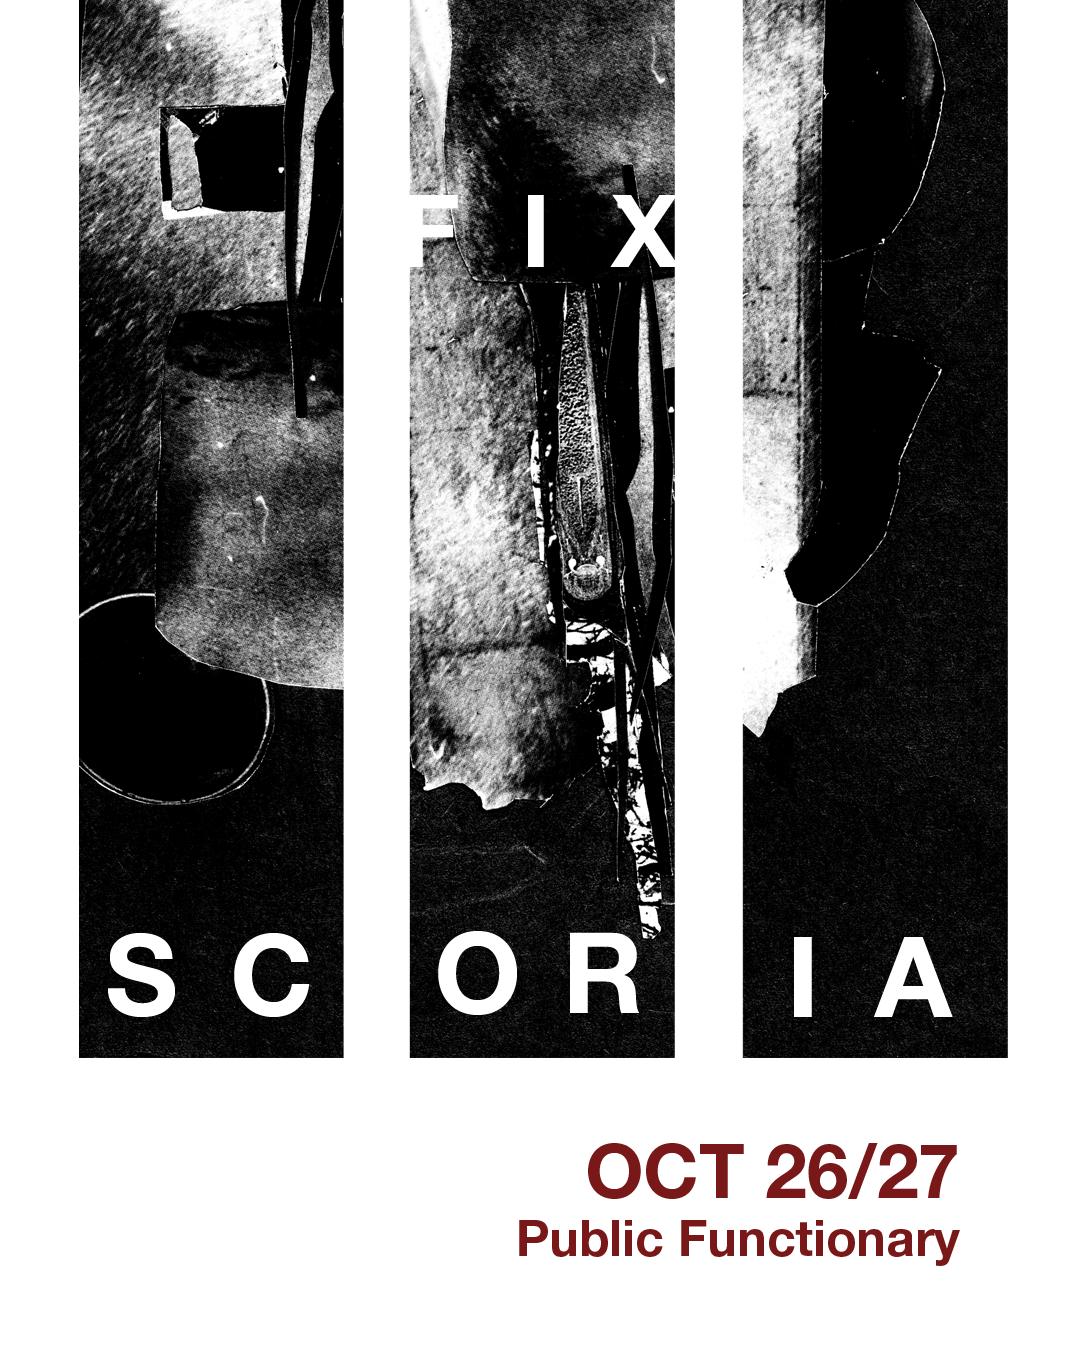 SCORIA_flyer